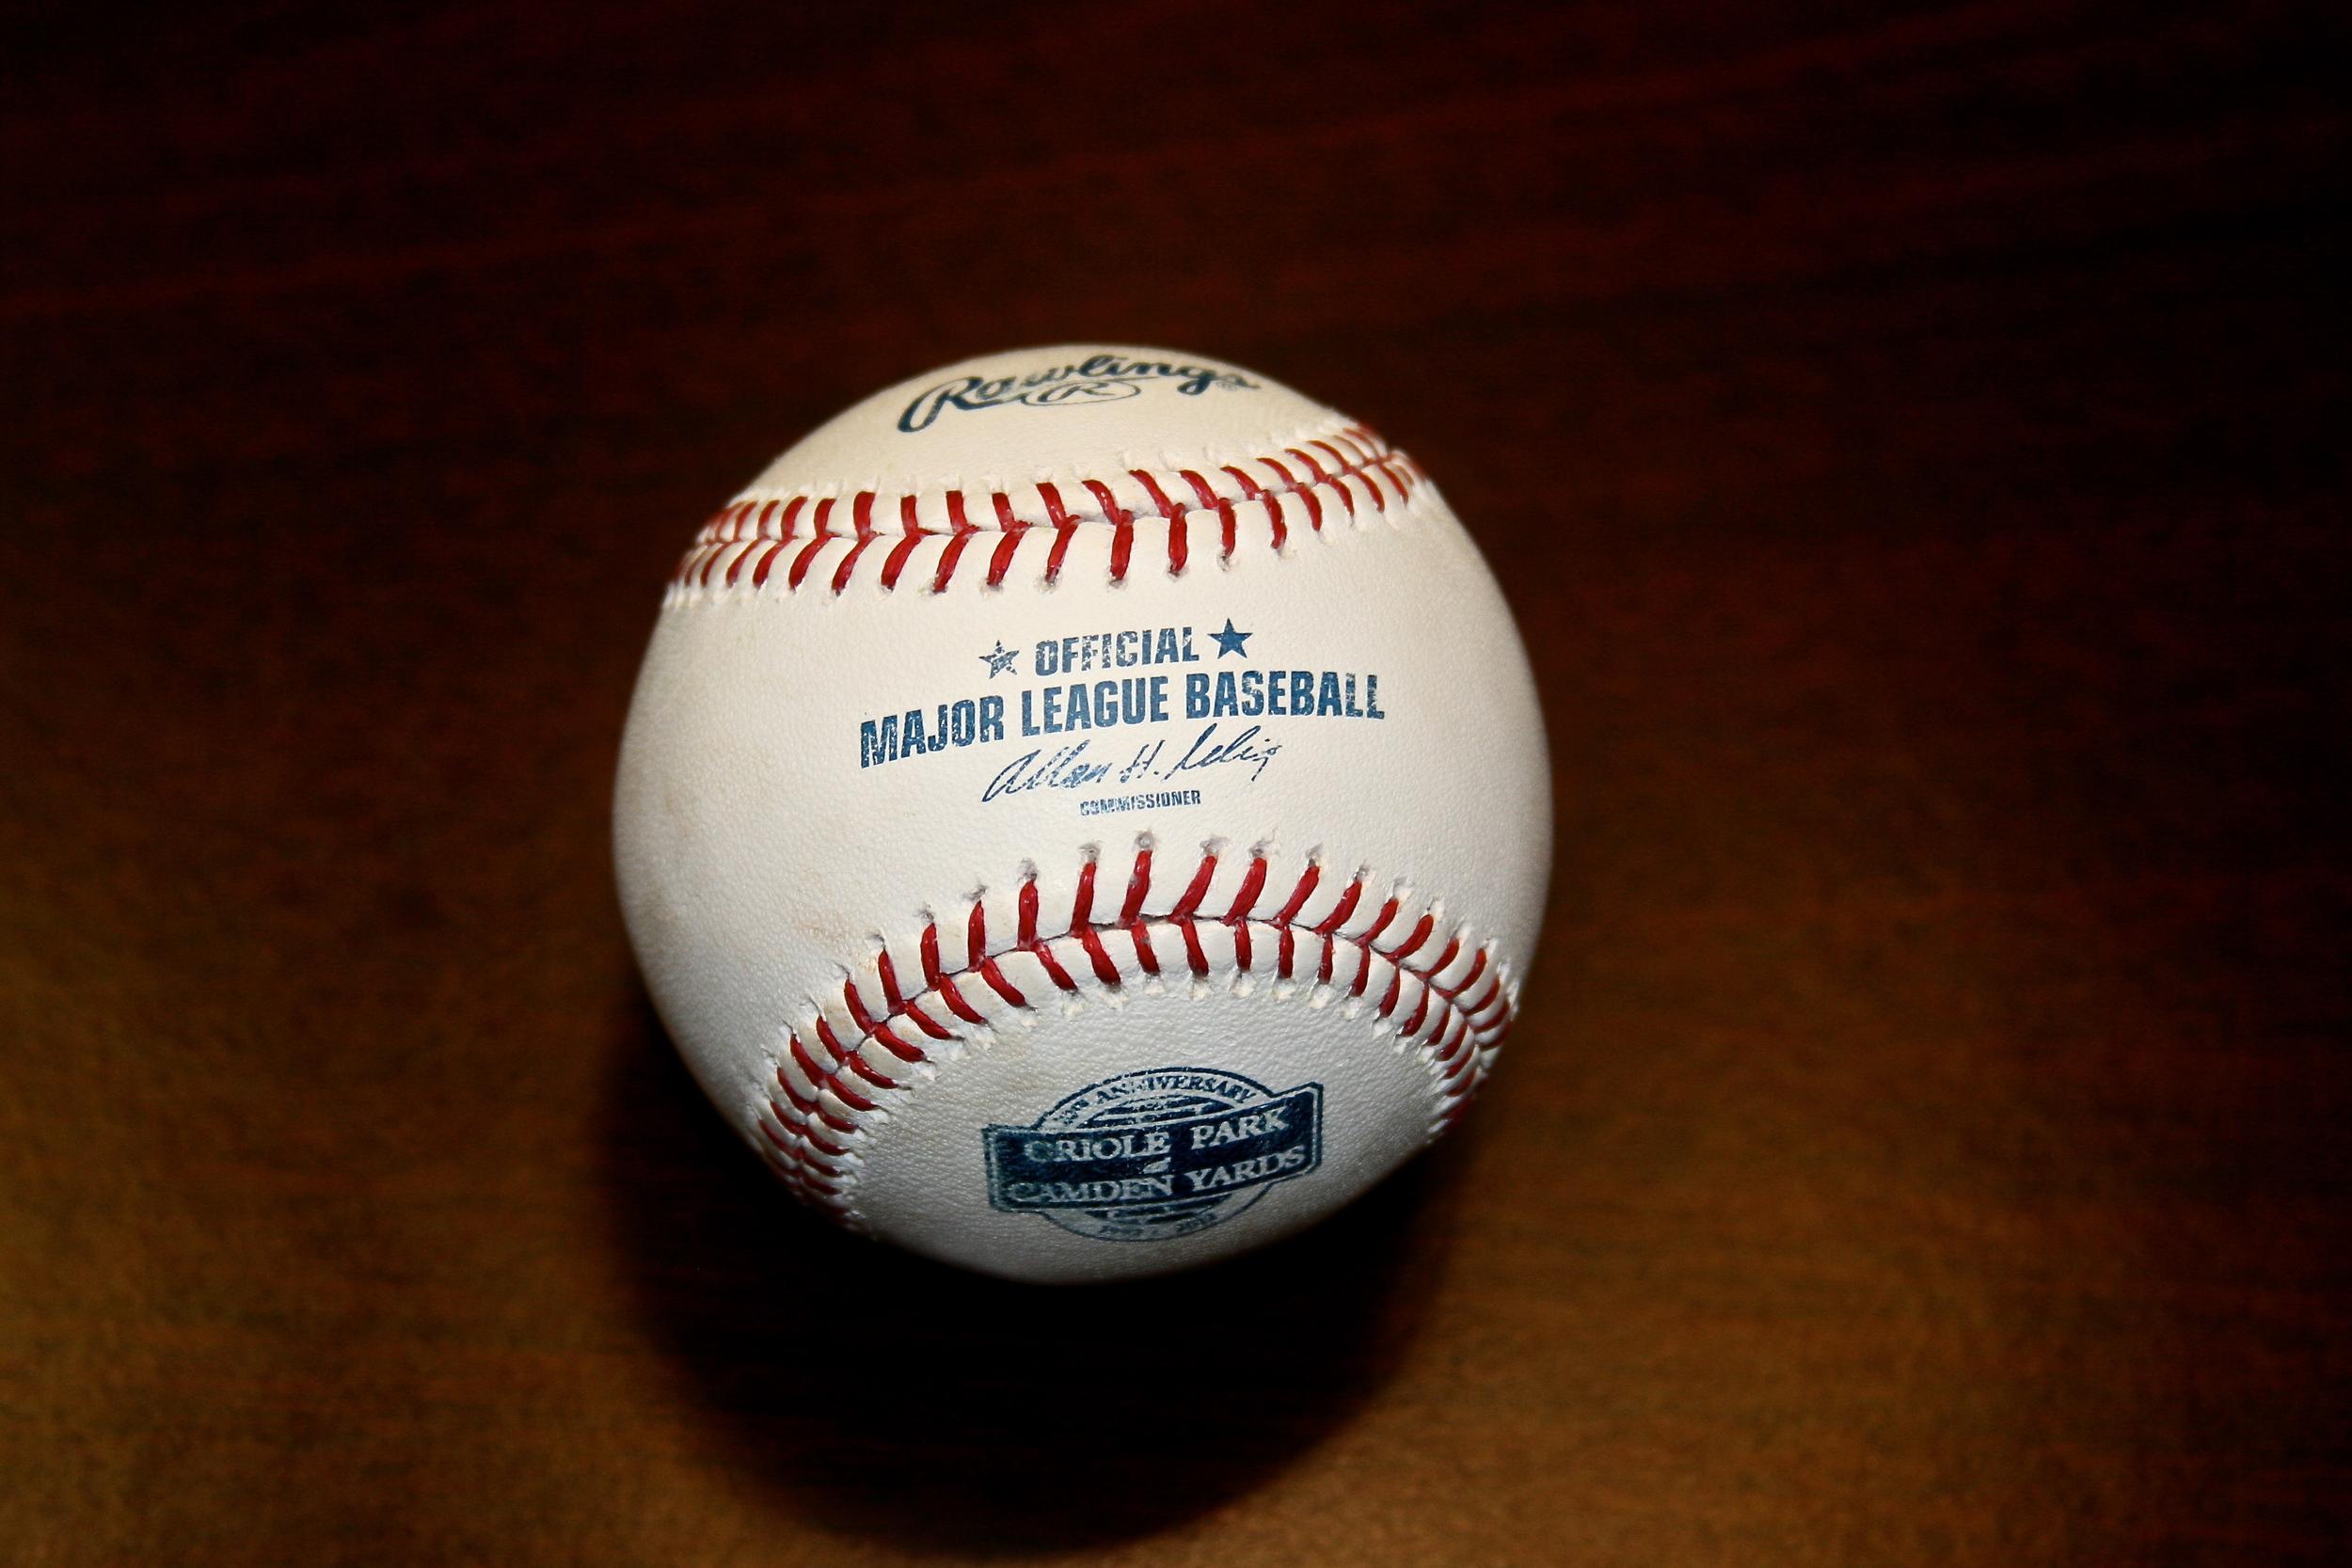 My first MLB ball